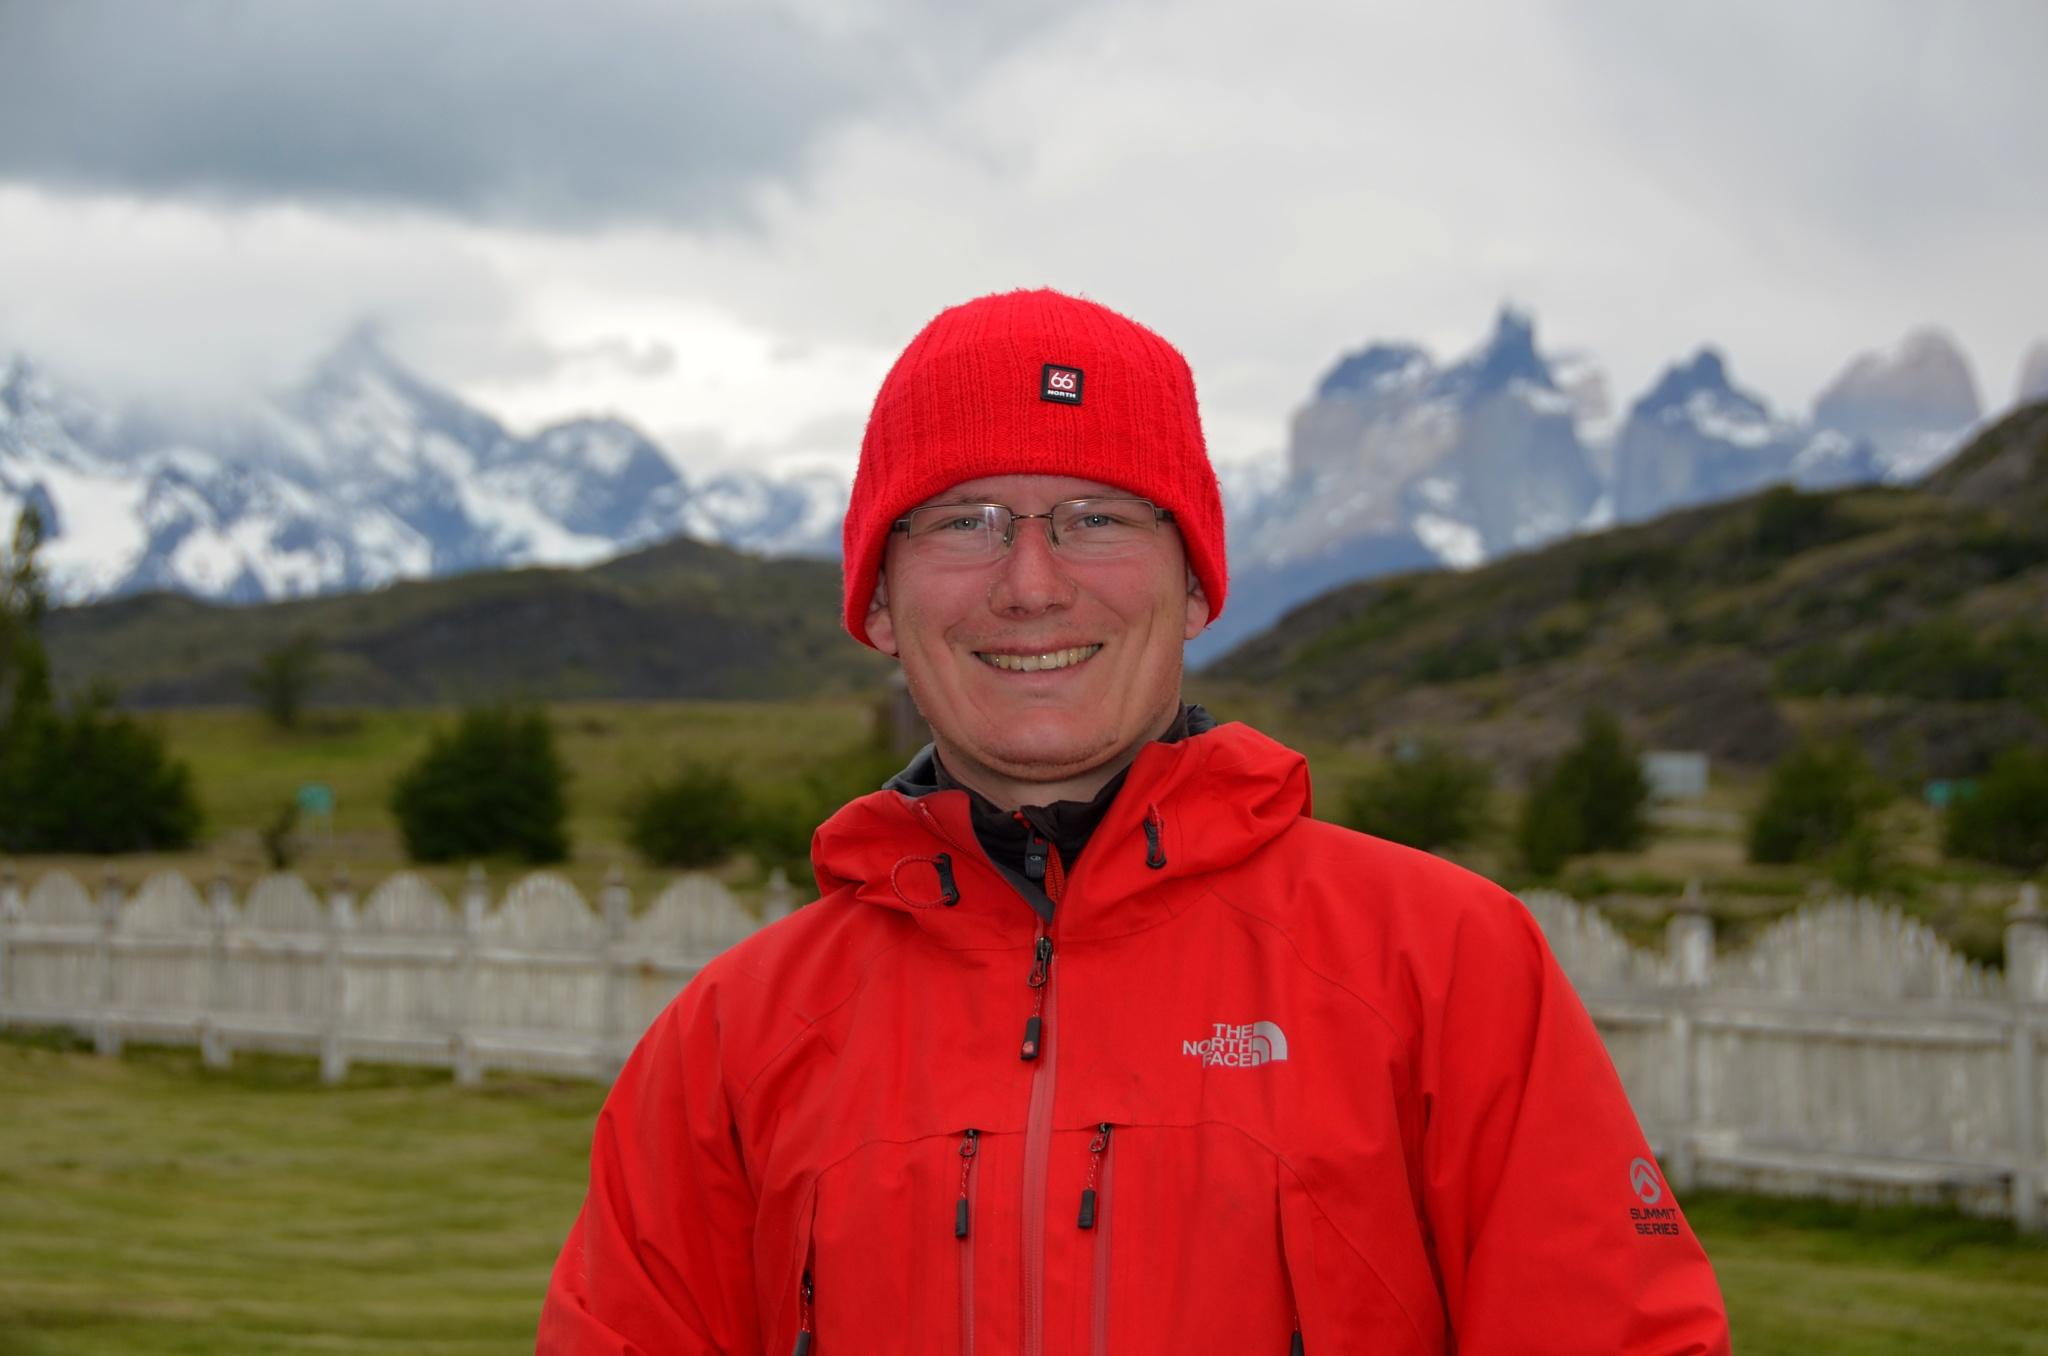 Poslední momentky s horami v Torres del Paine